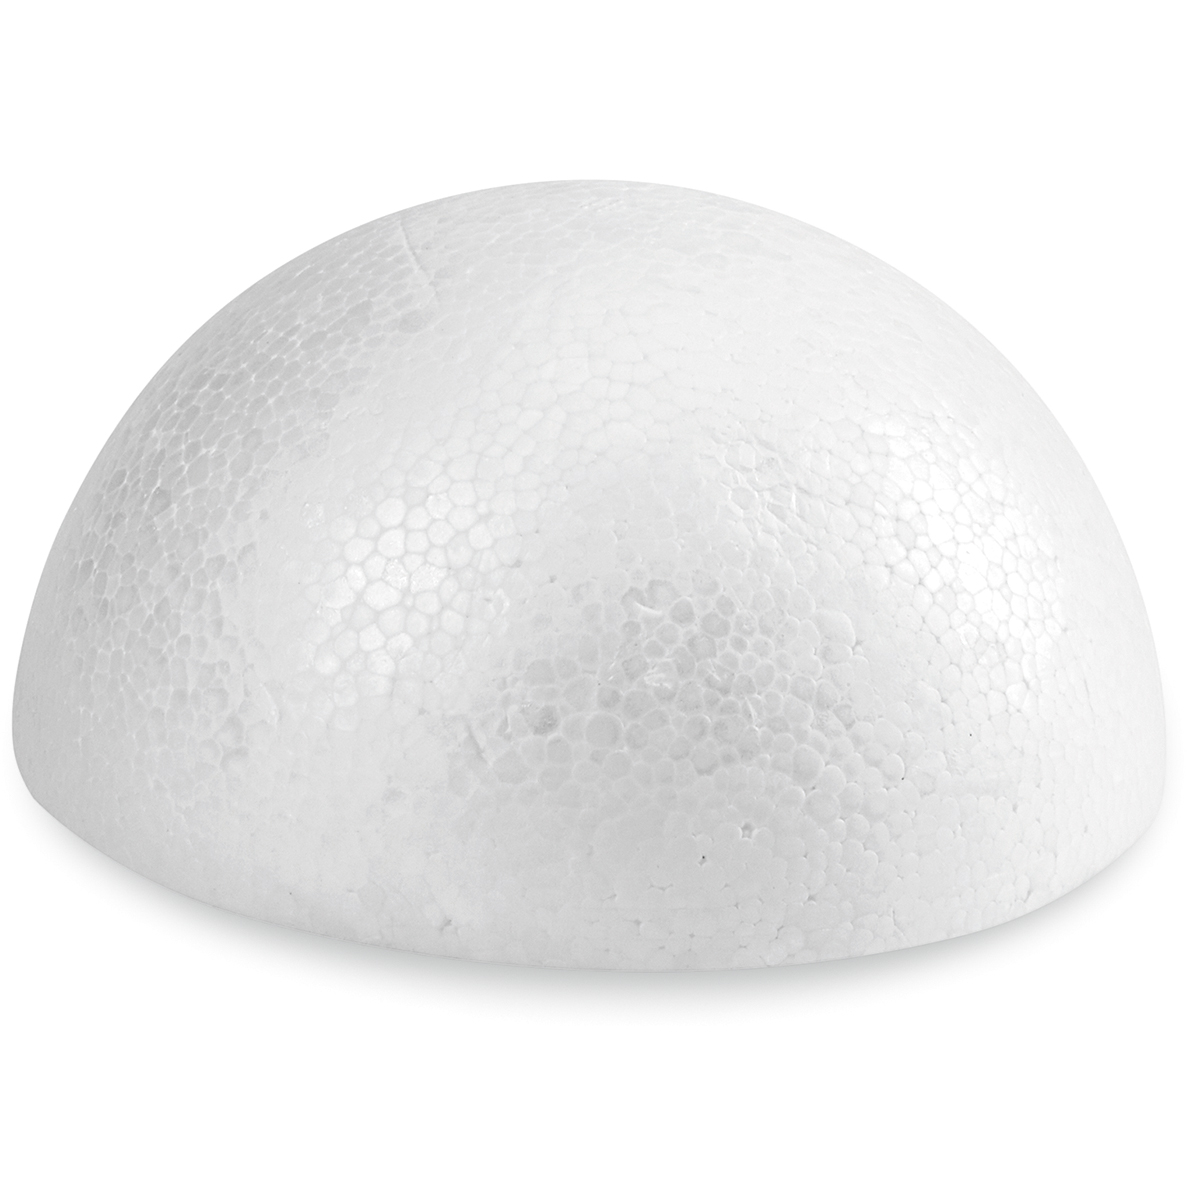 SMOOTH FOAM 1/2 BALL